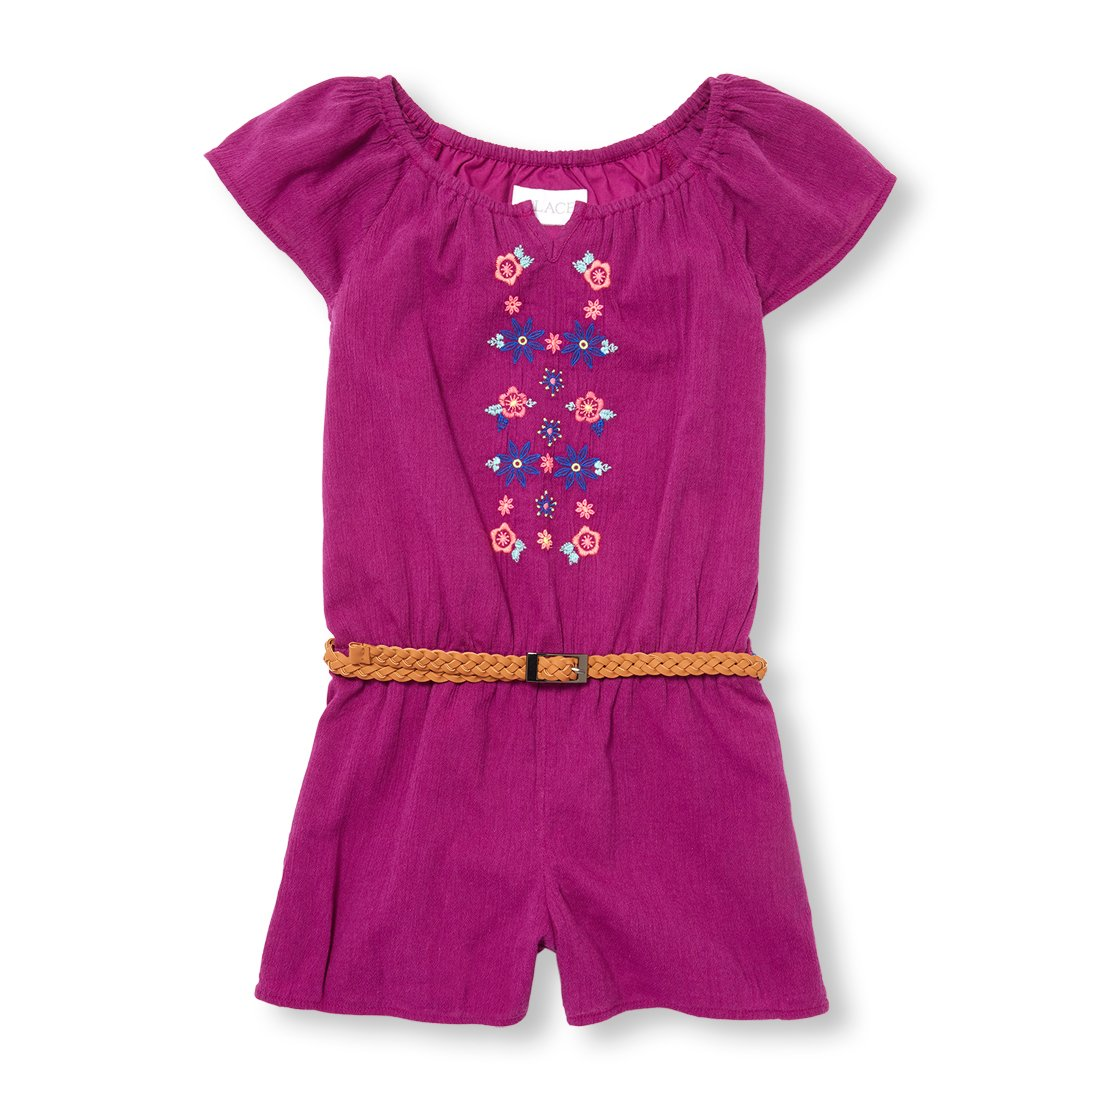 The Children's Place Big Girls' Short Sleeve Romper, Orchidzing 00863, S (5/6)